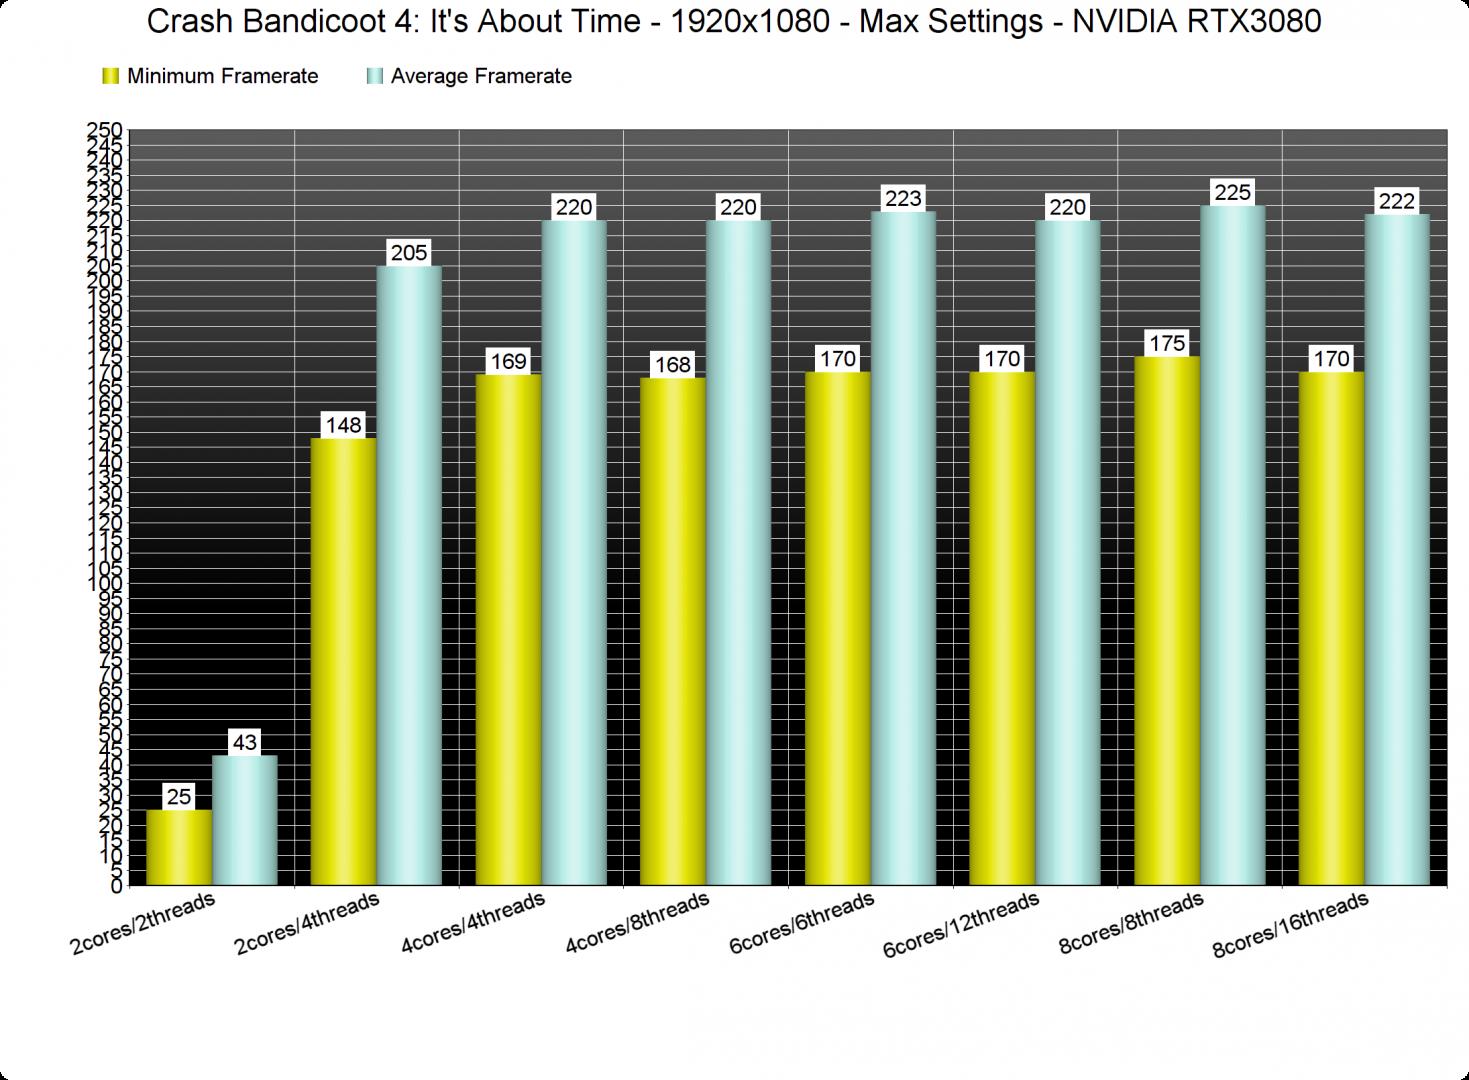 Crash Bandicoot 4 CPU benchmarks